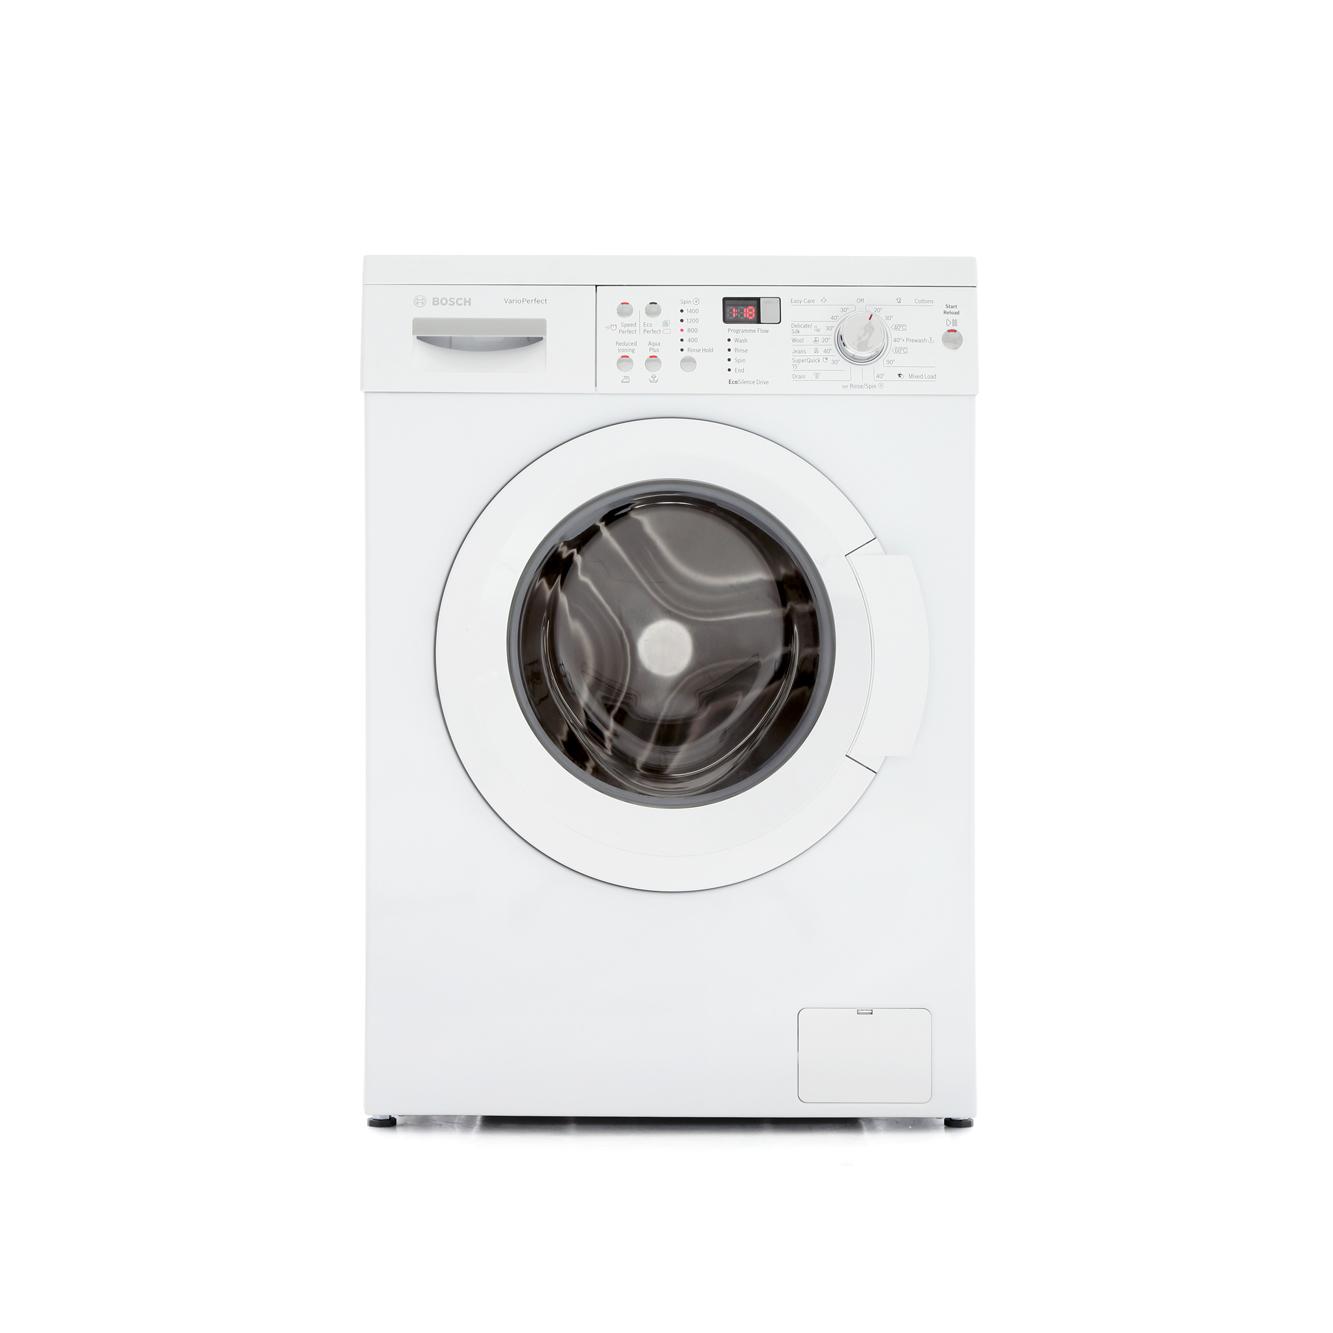 buy bosch series 6 waq283s1gb washing machine waq283s1gb. Black Bedroom Furniture Sets. Home Design Ideas